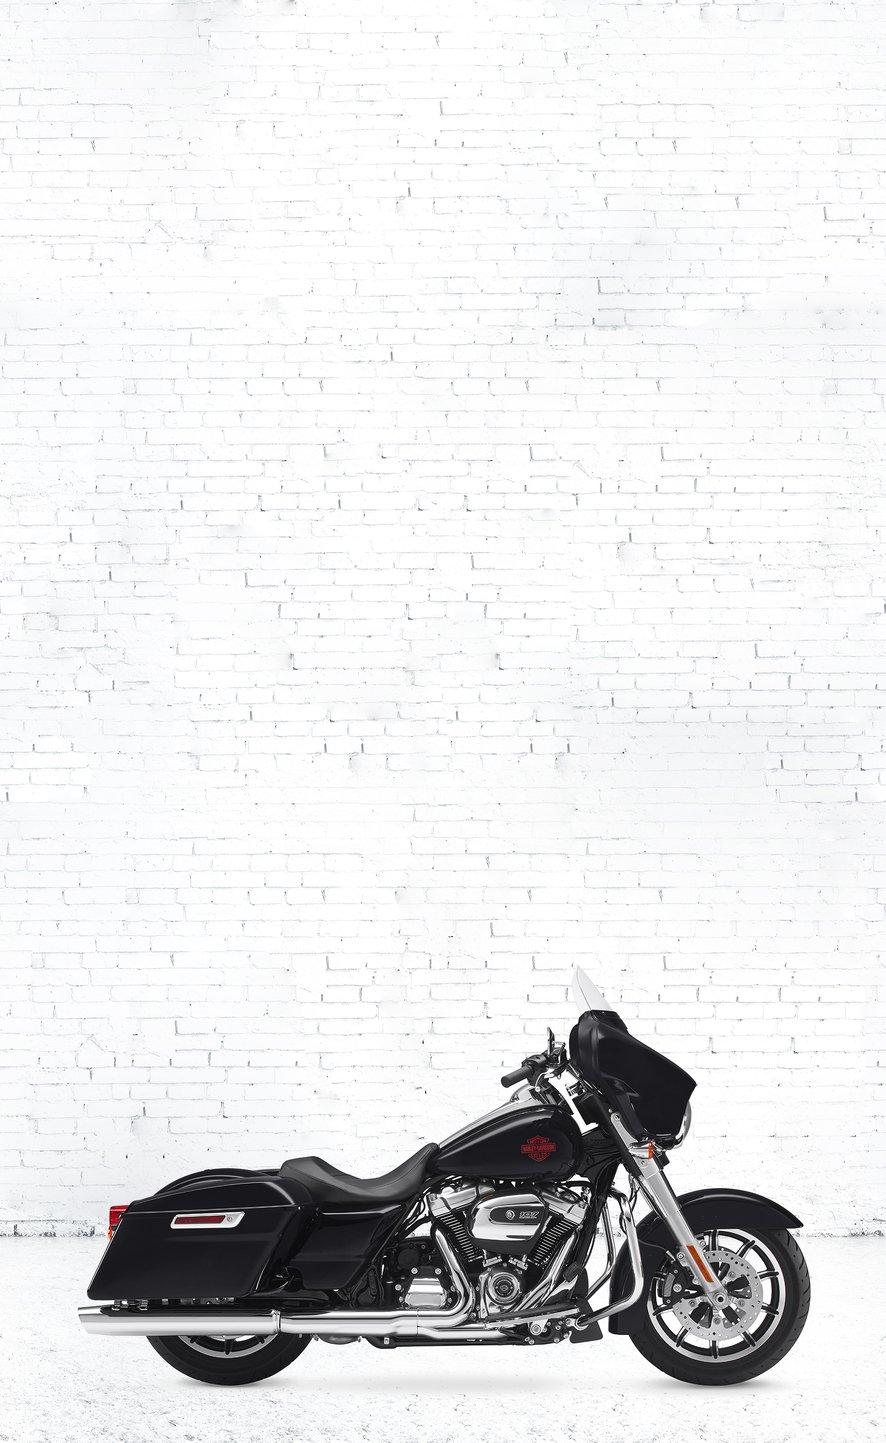 2019 Street Glide Special Motorcycle | Harley-Davidson USA on harley fat boy fuse box, harley bobber fuse box, yamaha warrior fuse box, harley accessories fuse box, road king fuse box, harley road glide fuse box, motorcycle fuse box, harley wide glide fuse box, harley sportster fuse box, harley dyna fuse box, harley davidson fuse box, kawasaki zx6r fuse box, cafe racer fuse box, chopper fuse box,